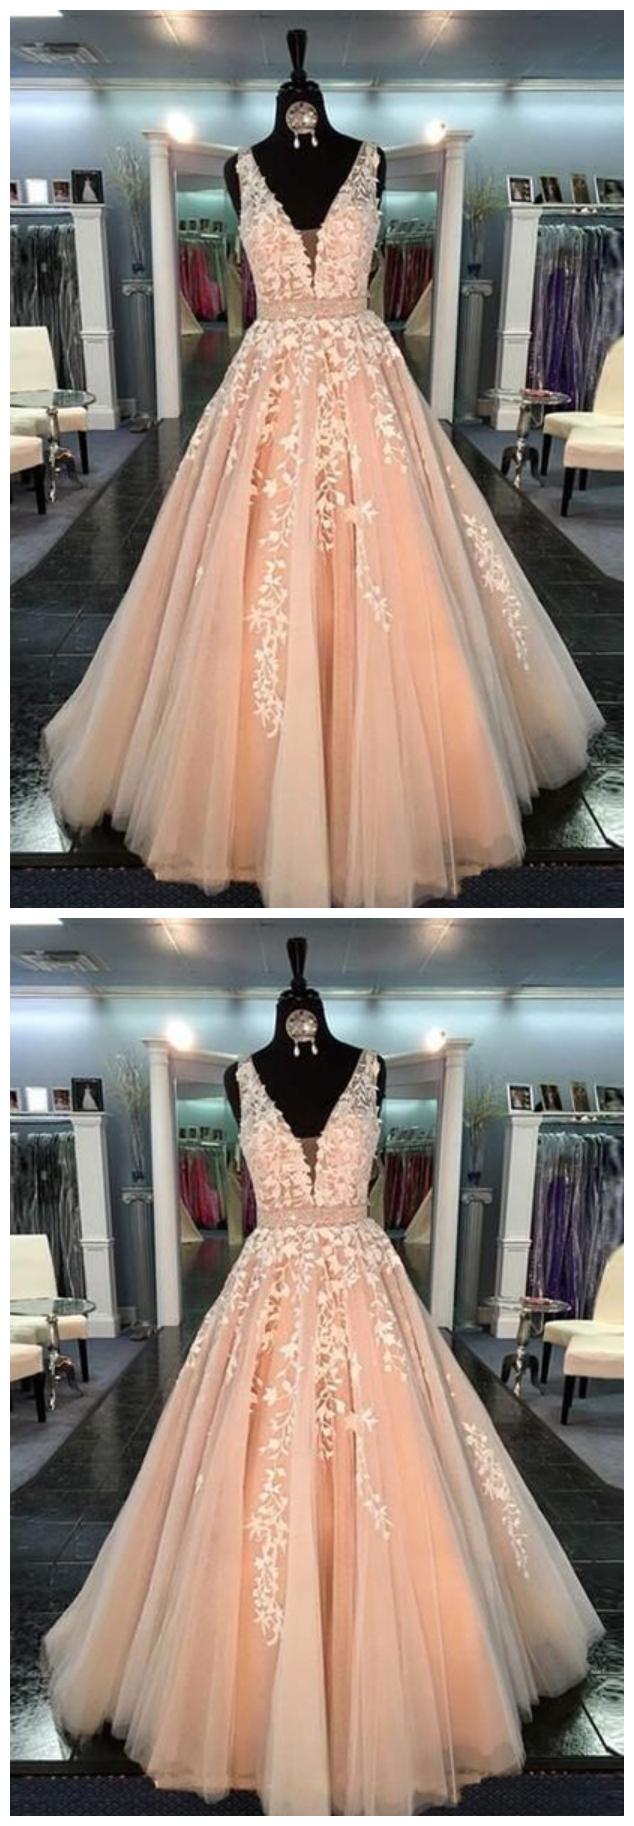 Charming Prom Dress,Applique Prom Dress,Illusion Prom Dress,Fashion ...